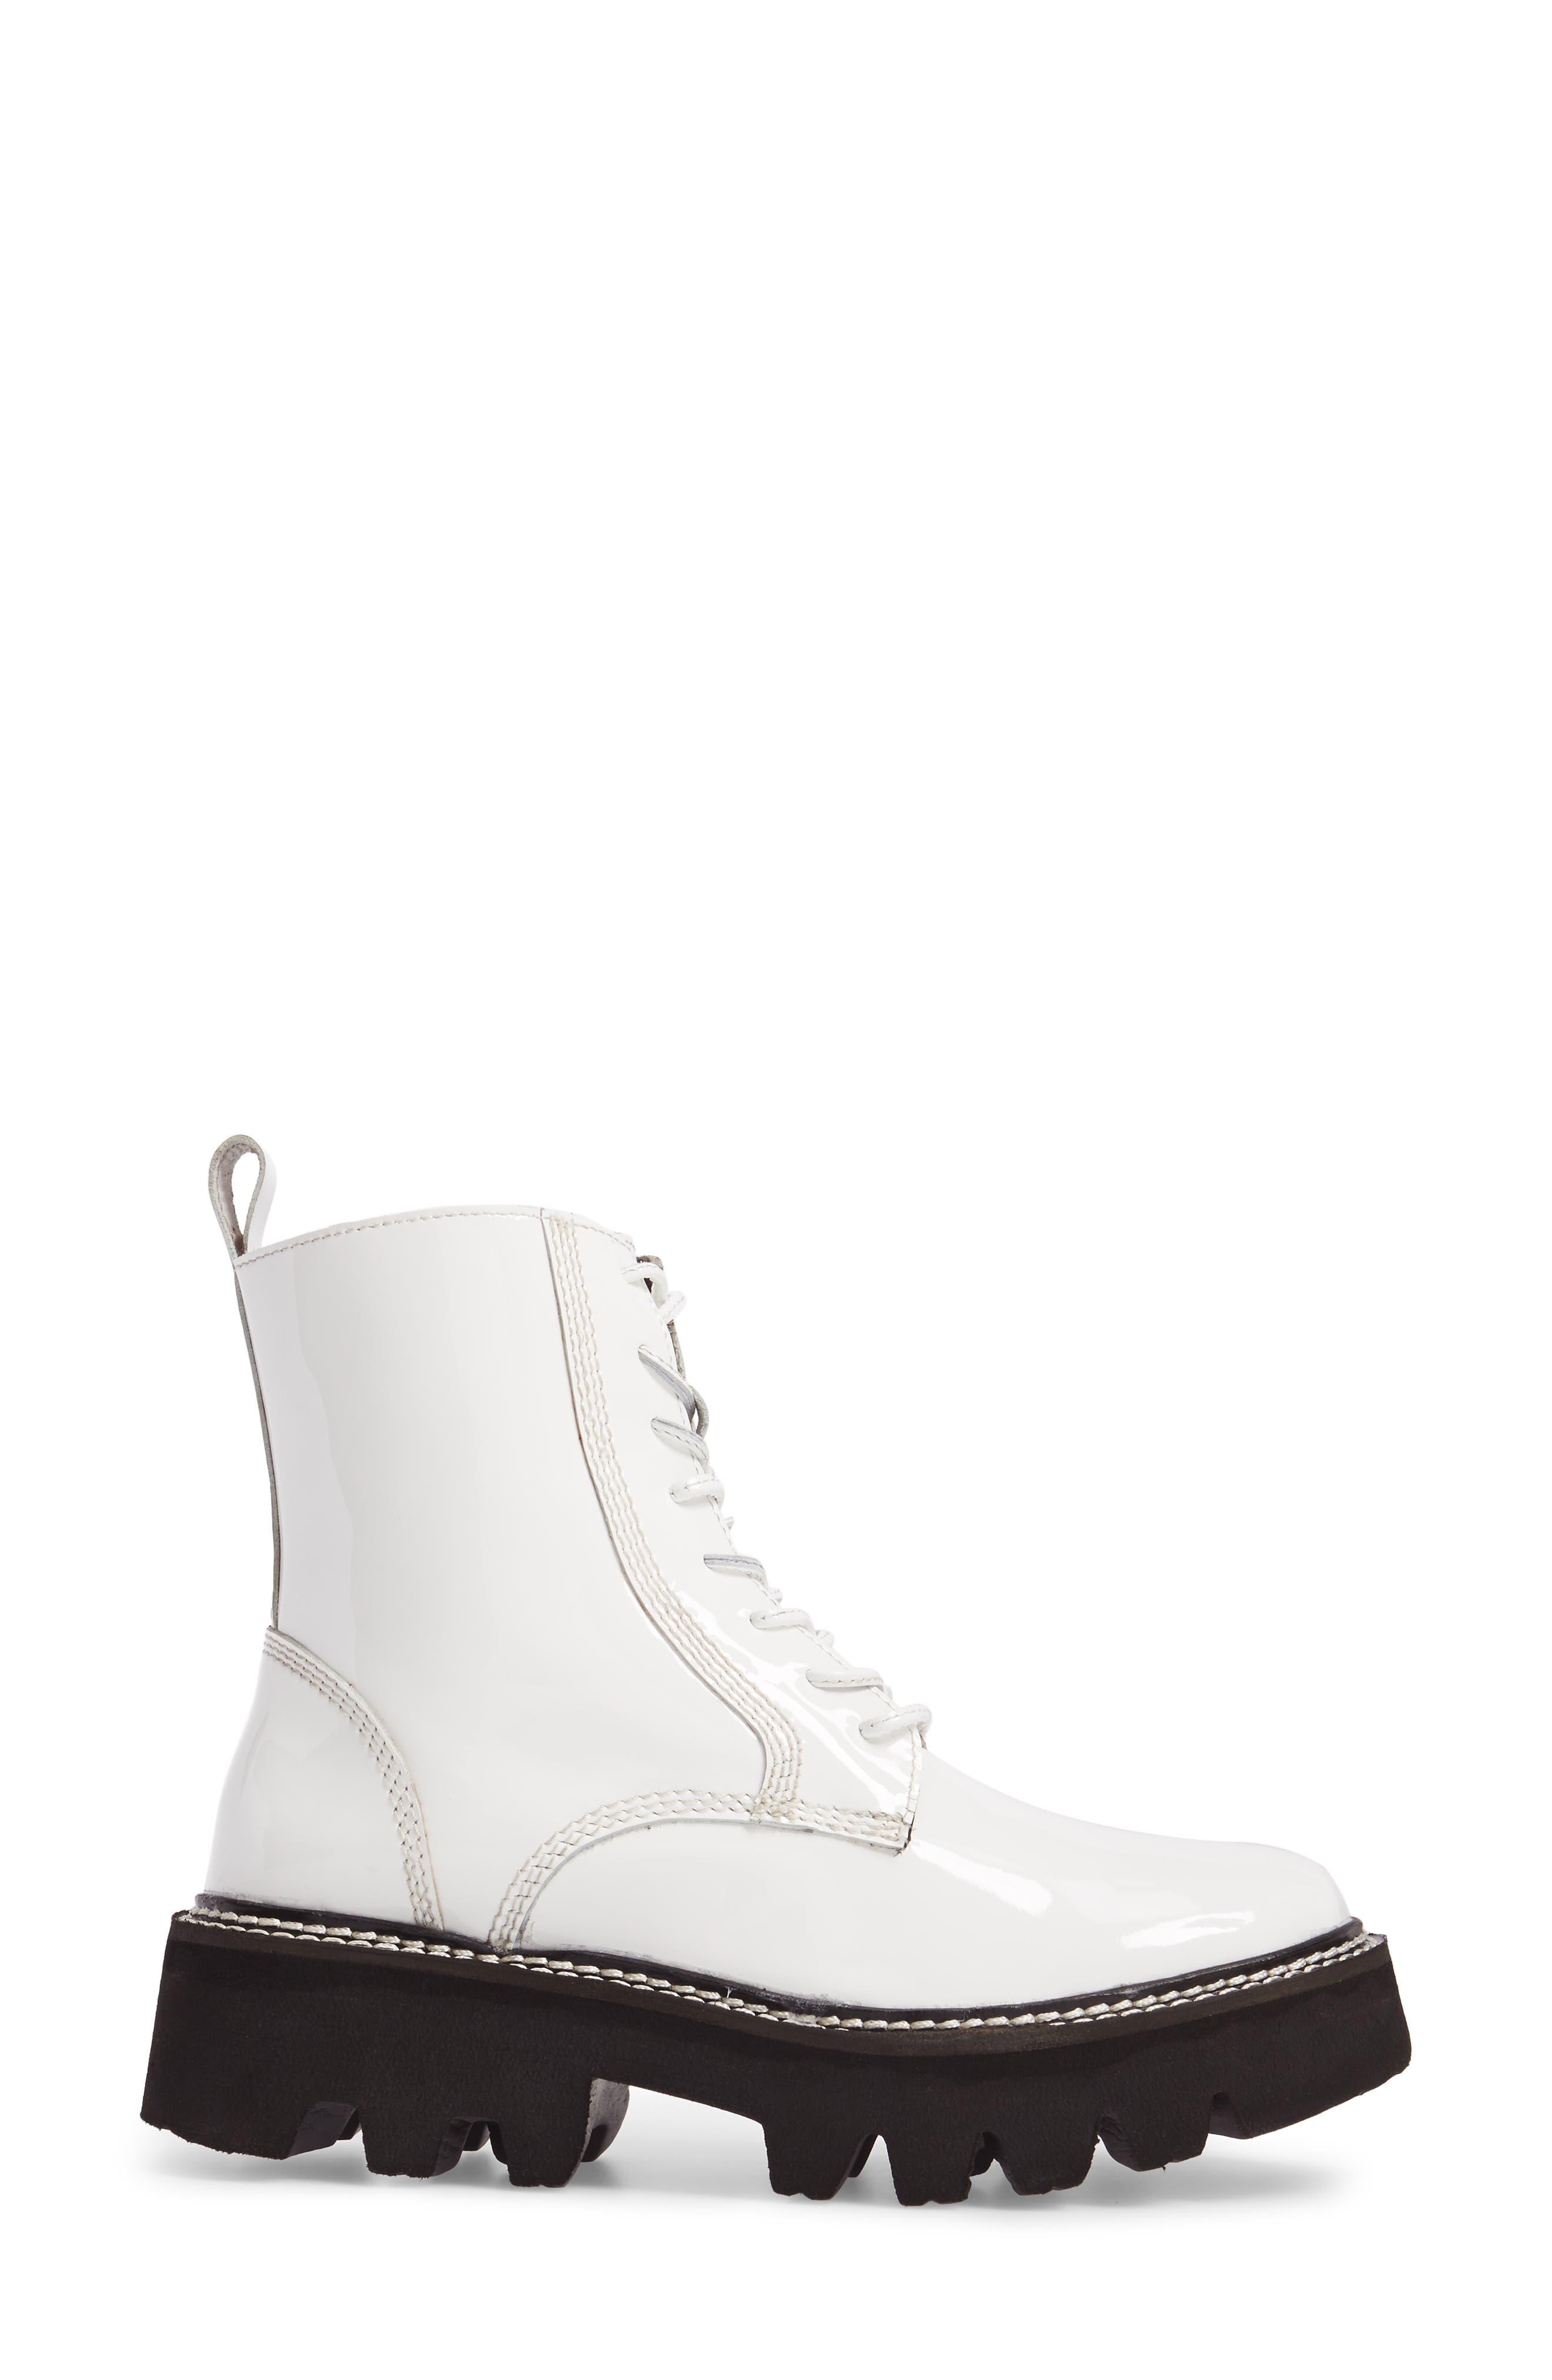 Agira Lug Boot,                             Alternate thumbnail 3, color,                             White Patent Leather